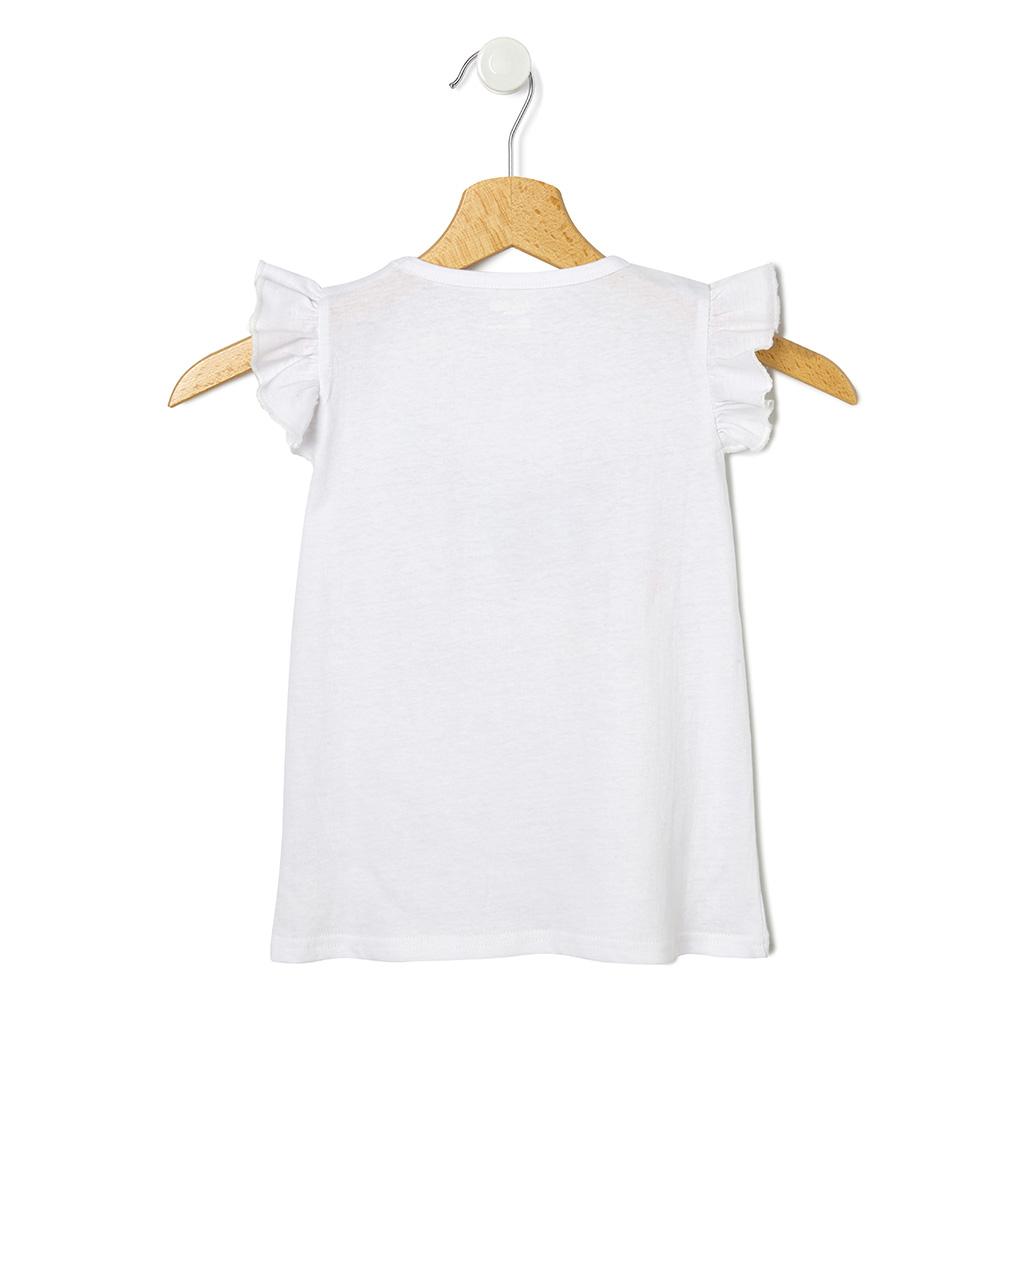 T-shirt manica corta e stampa farfalle - Prénatal